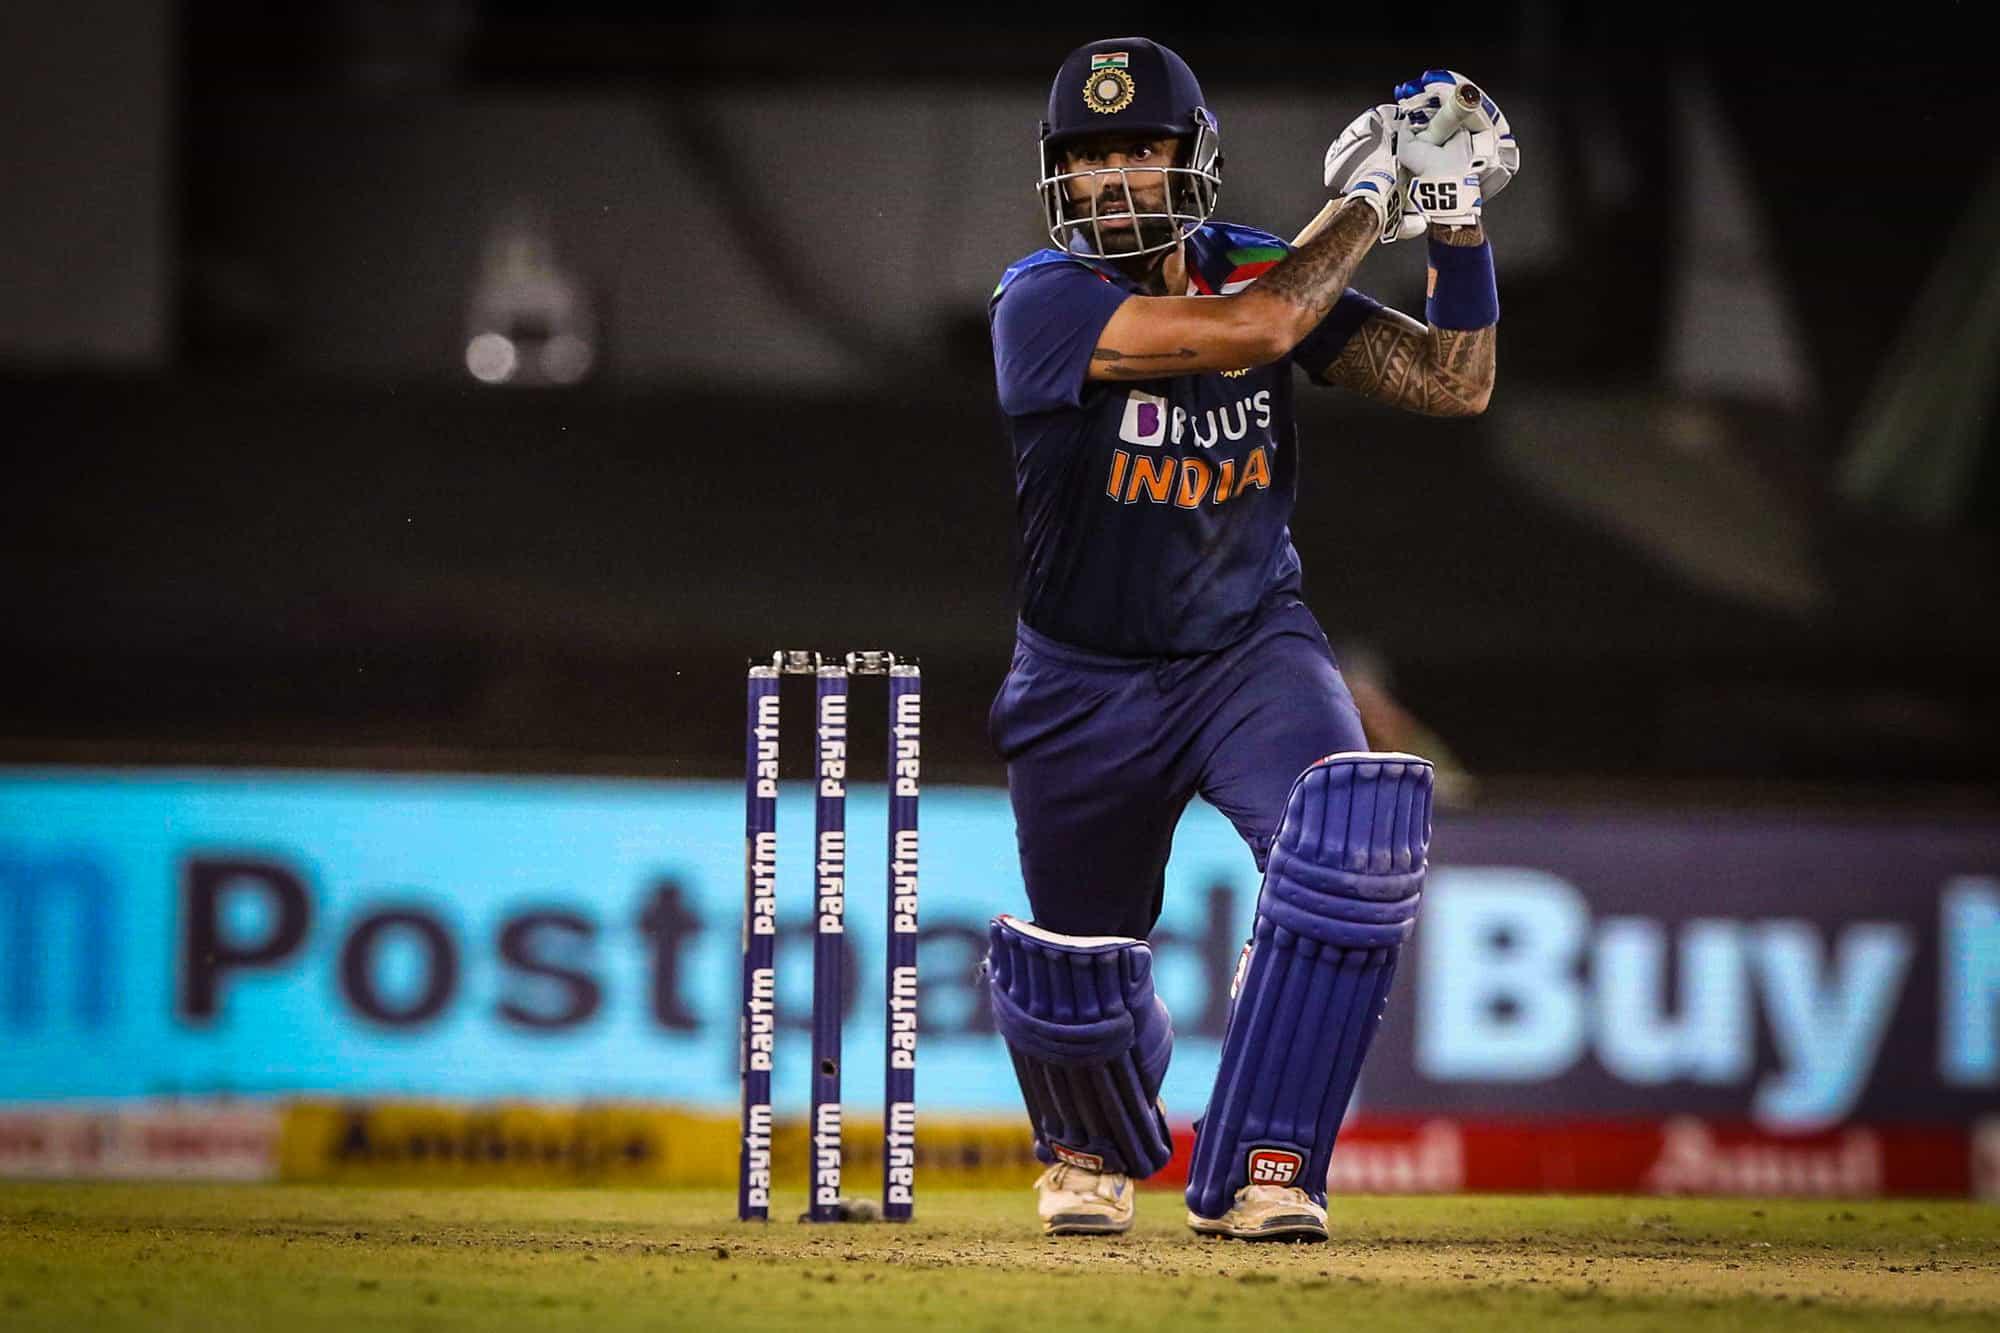 IND vs ENG 4th T20I: Suryakumar Yadav's Blistering Fifty